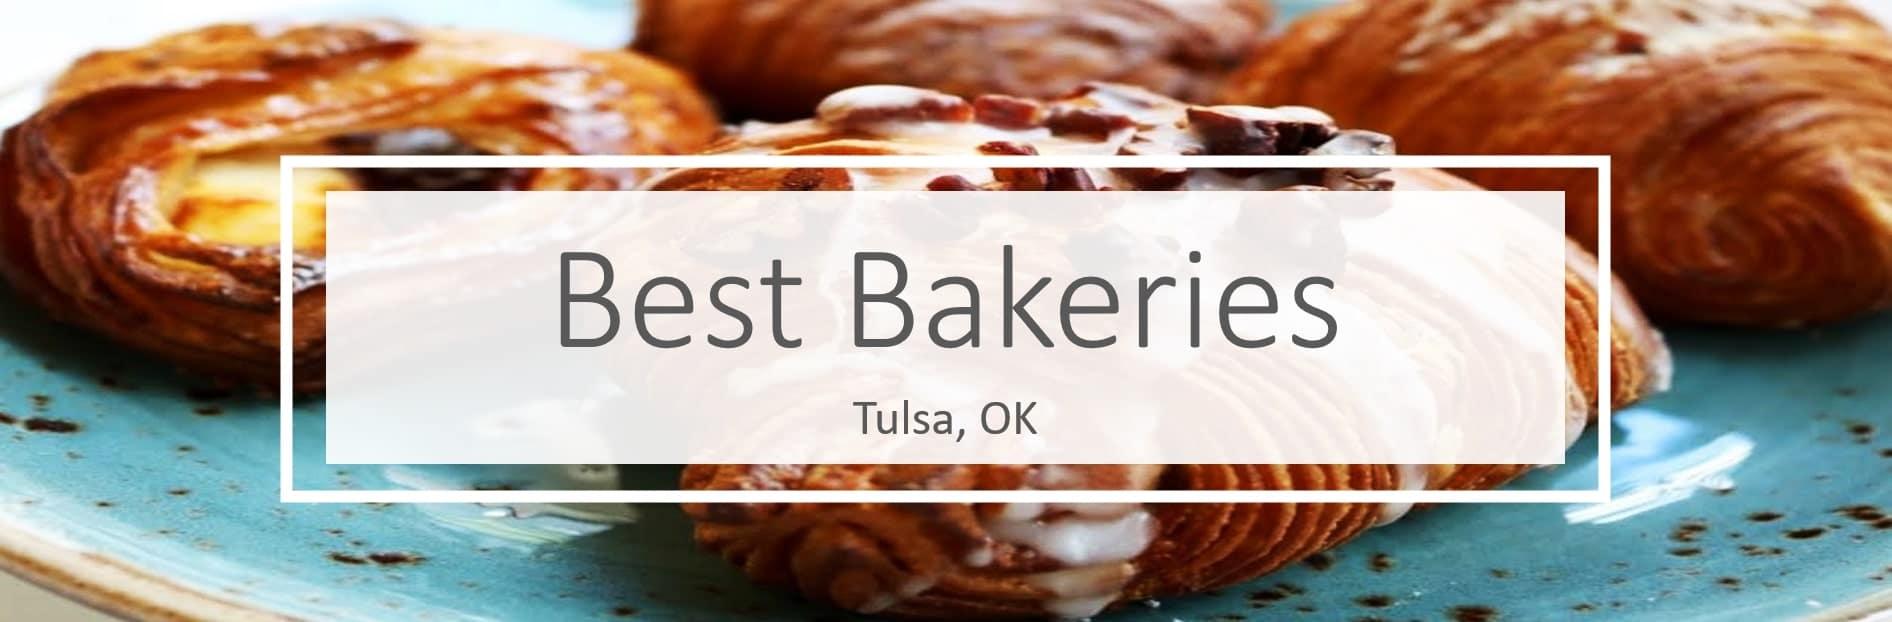 Best Bakeries in Tulsa